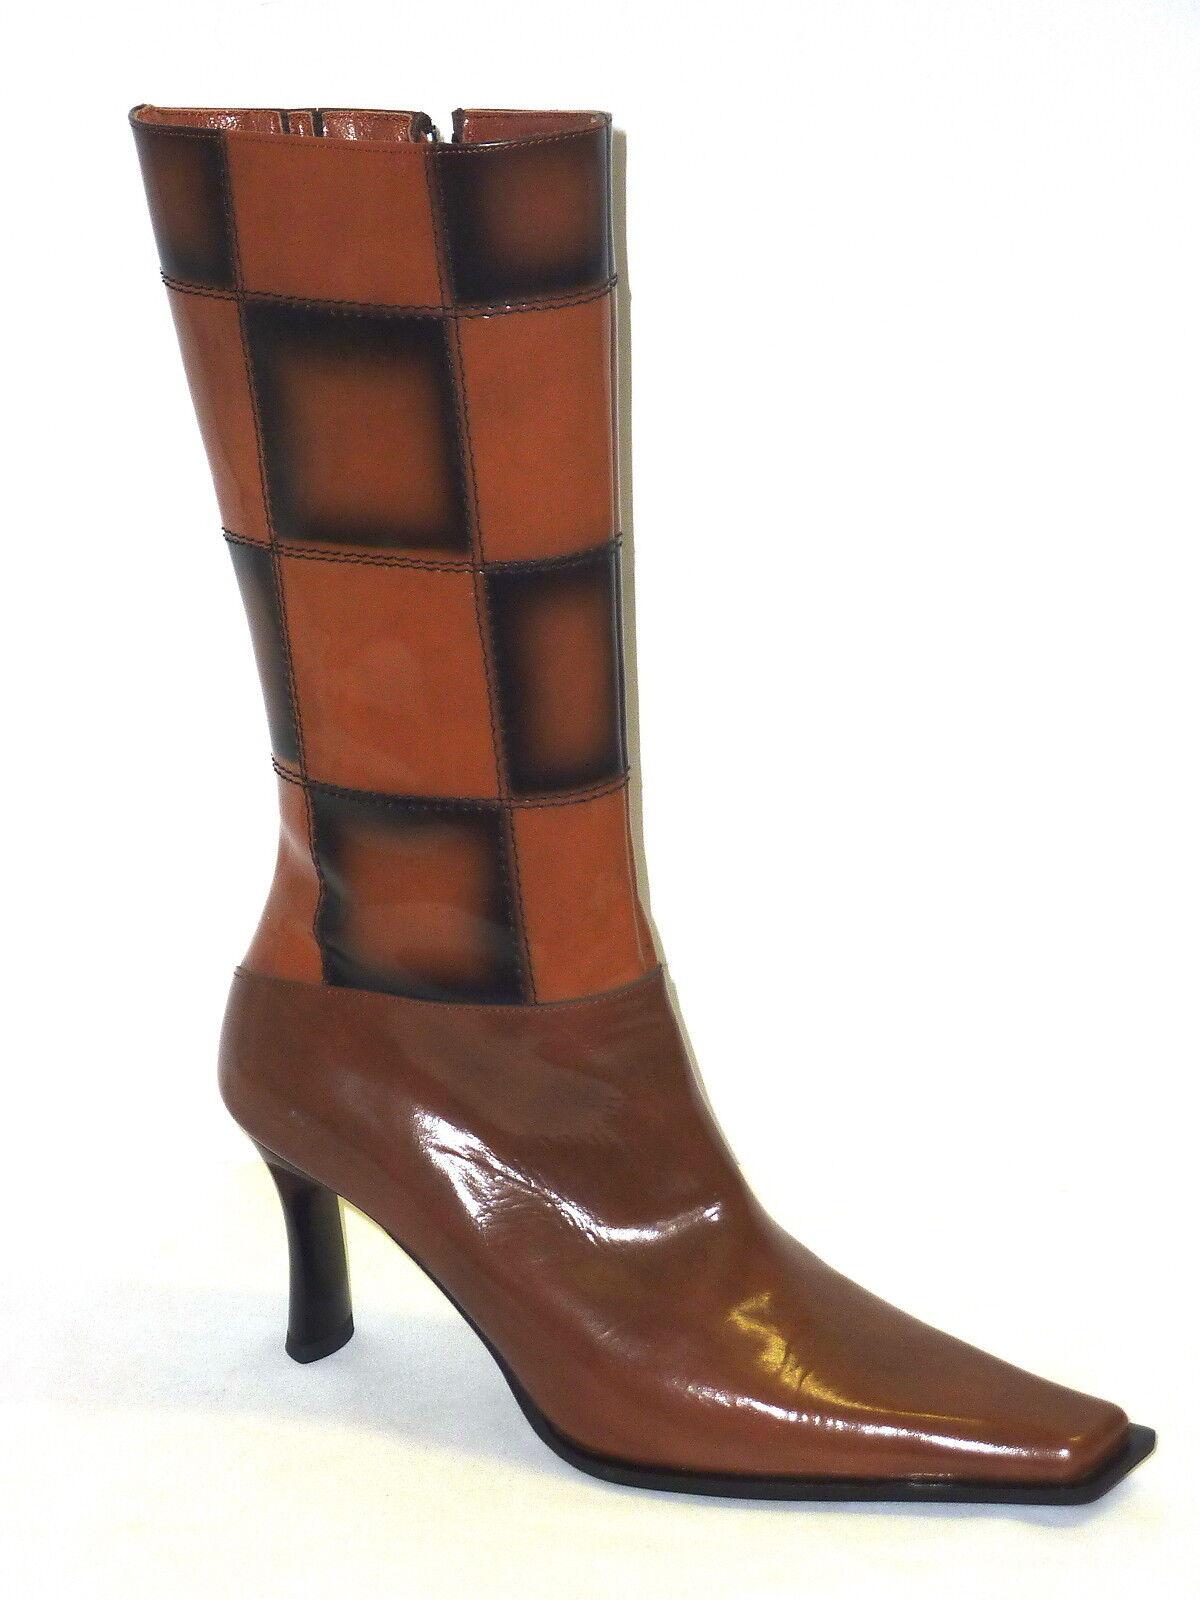 ILIAN FOSSA' STIVALI women STIVALETTI PELLE VERNICE shoes MODA brown-black 38